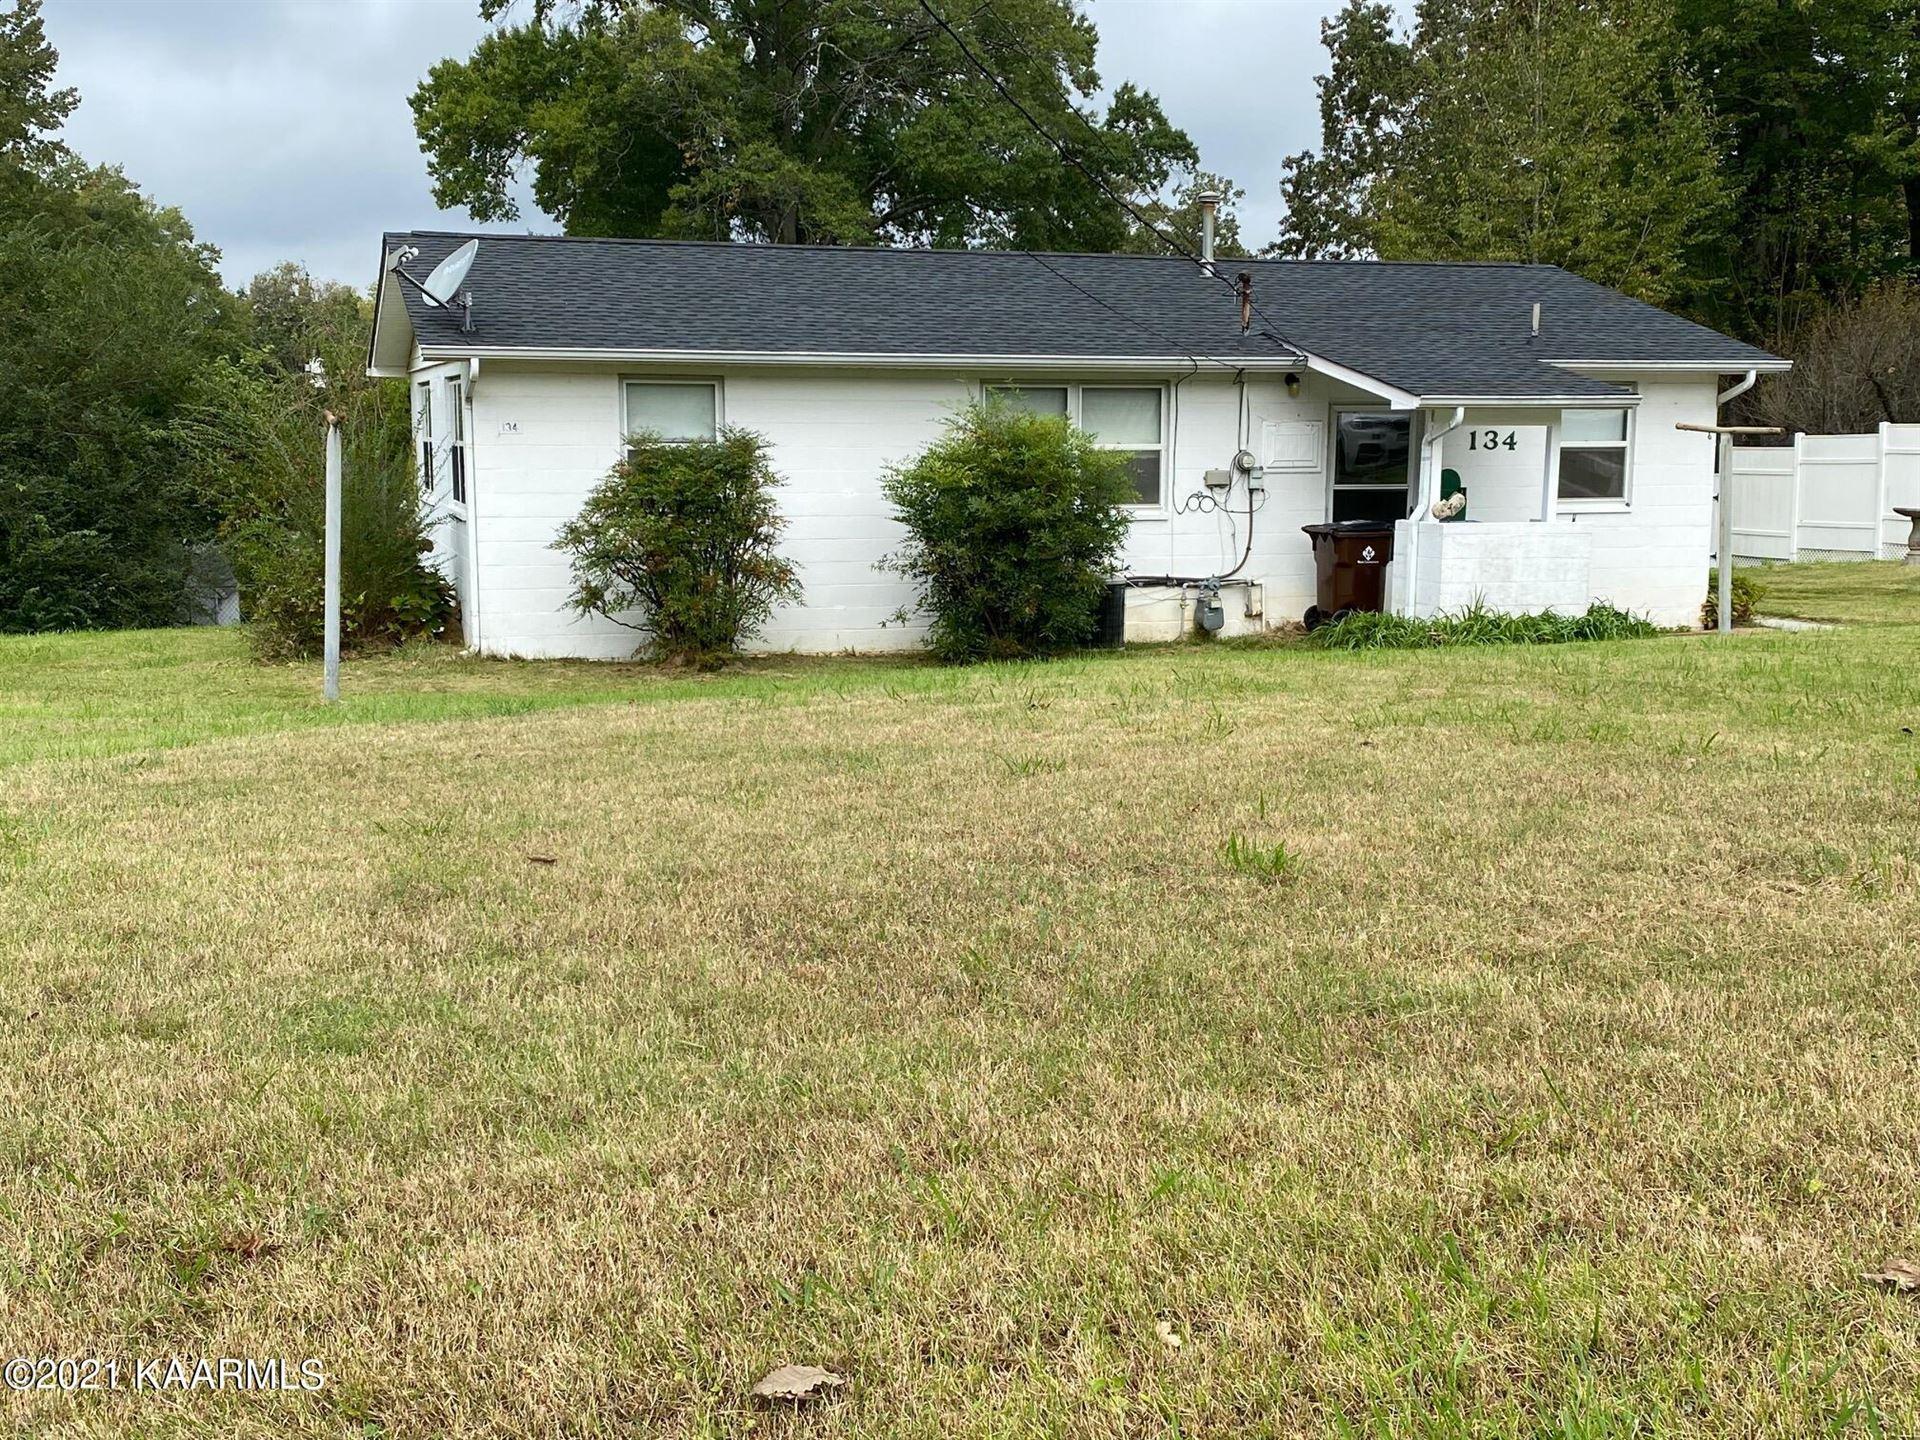 Photo of 134 W Gettysburg Ave, Oak Ridge, TN 37830 (MLS # 1170543)